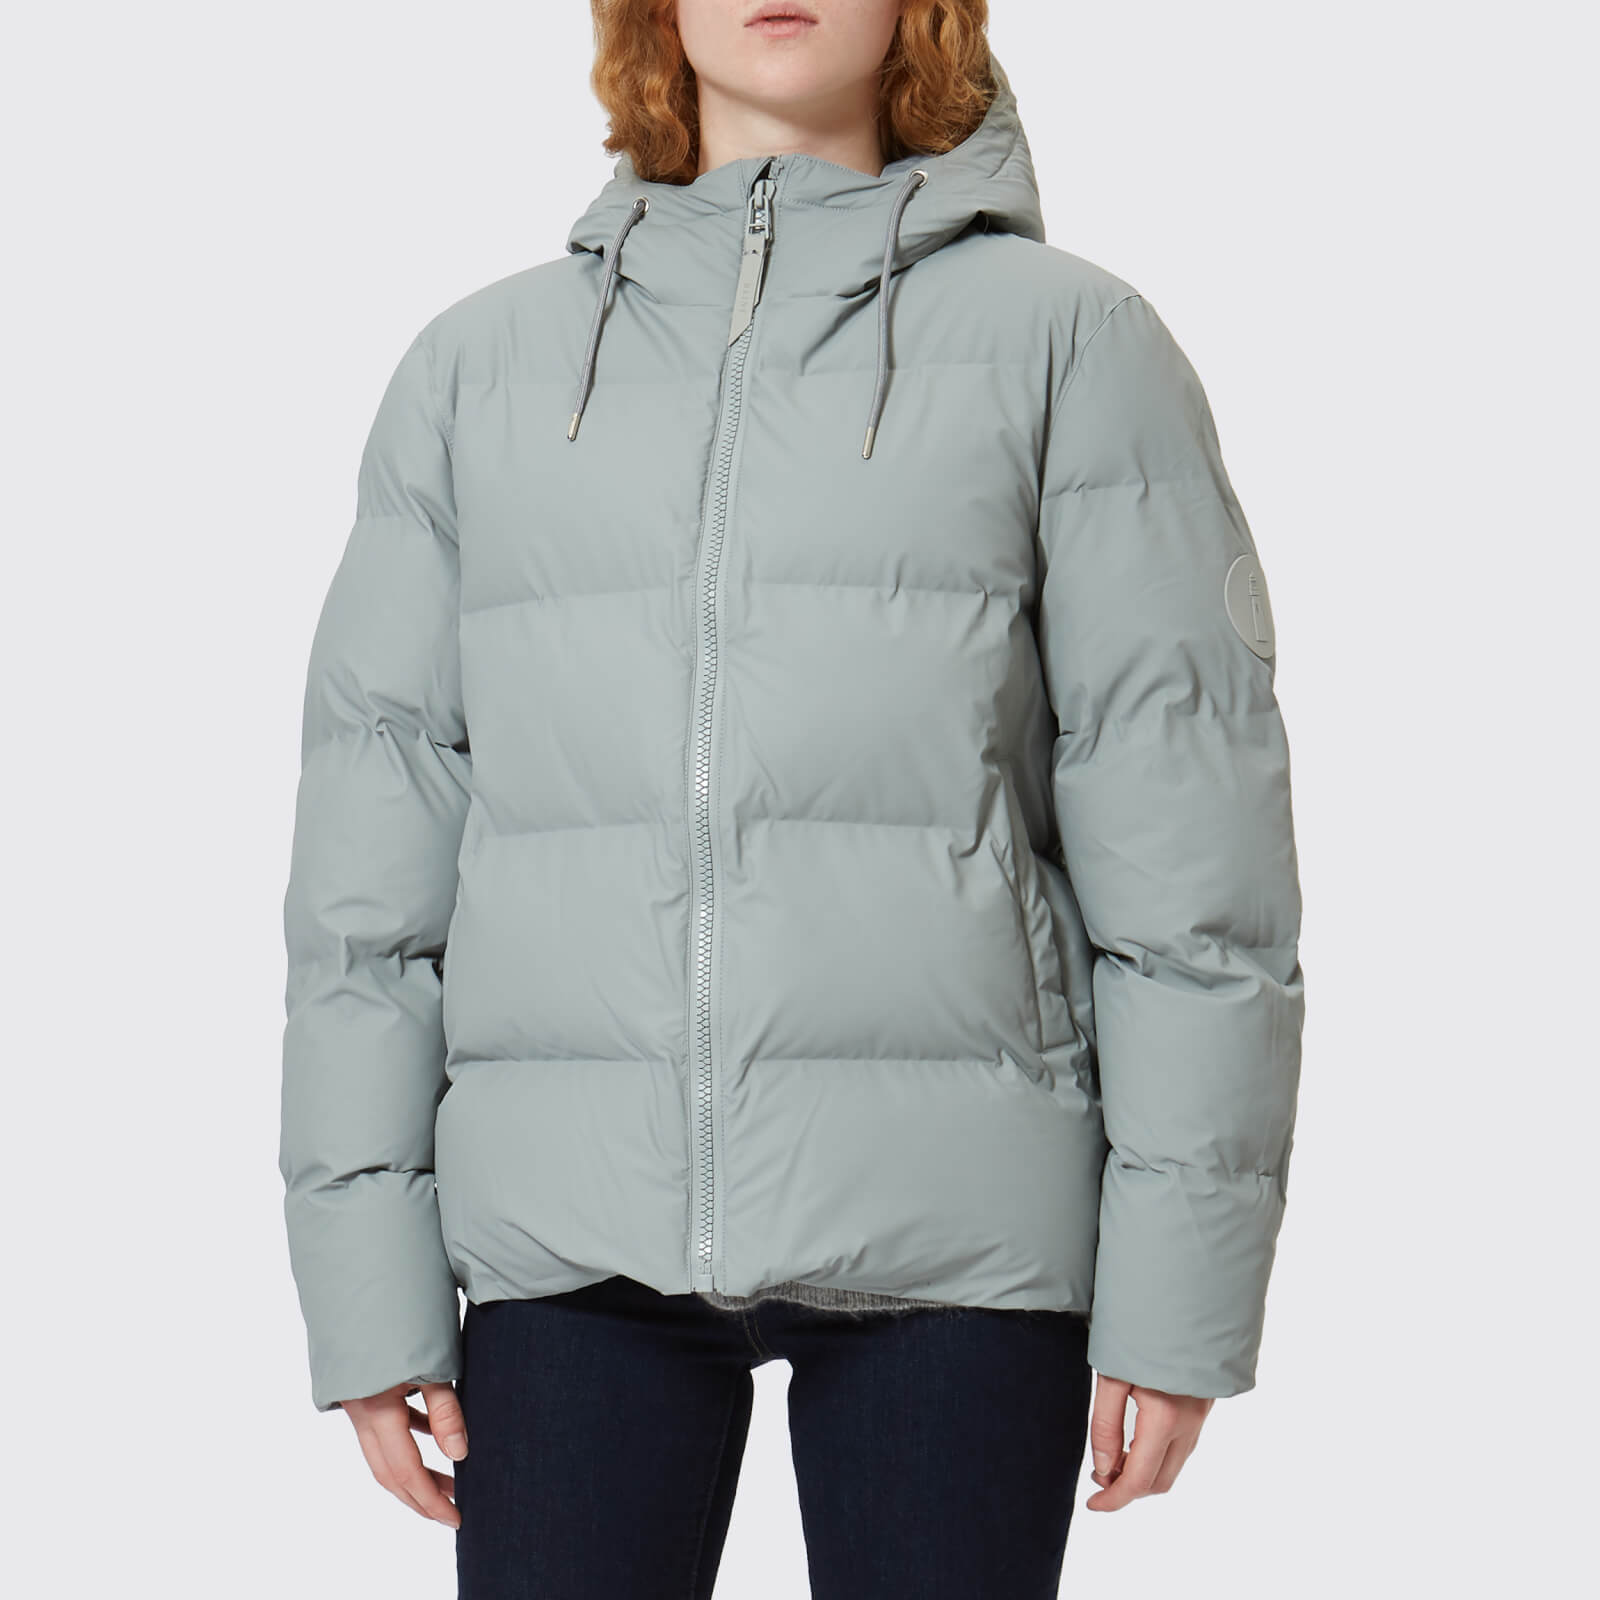 7733ada47 RAINS Women's Puffa Jacket - Stone - Free UK Delivery over £50